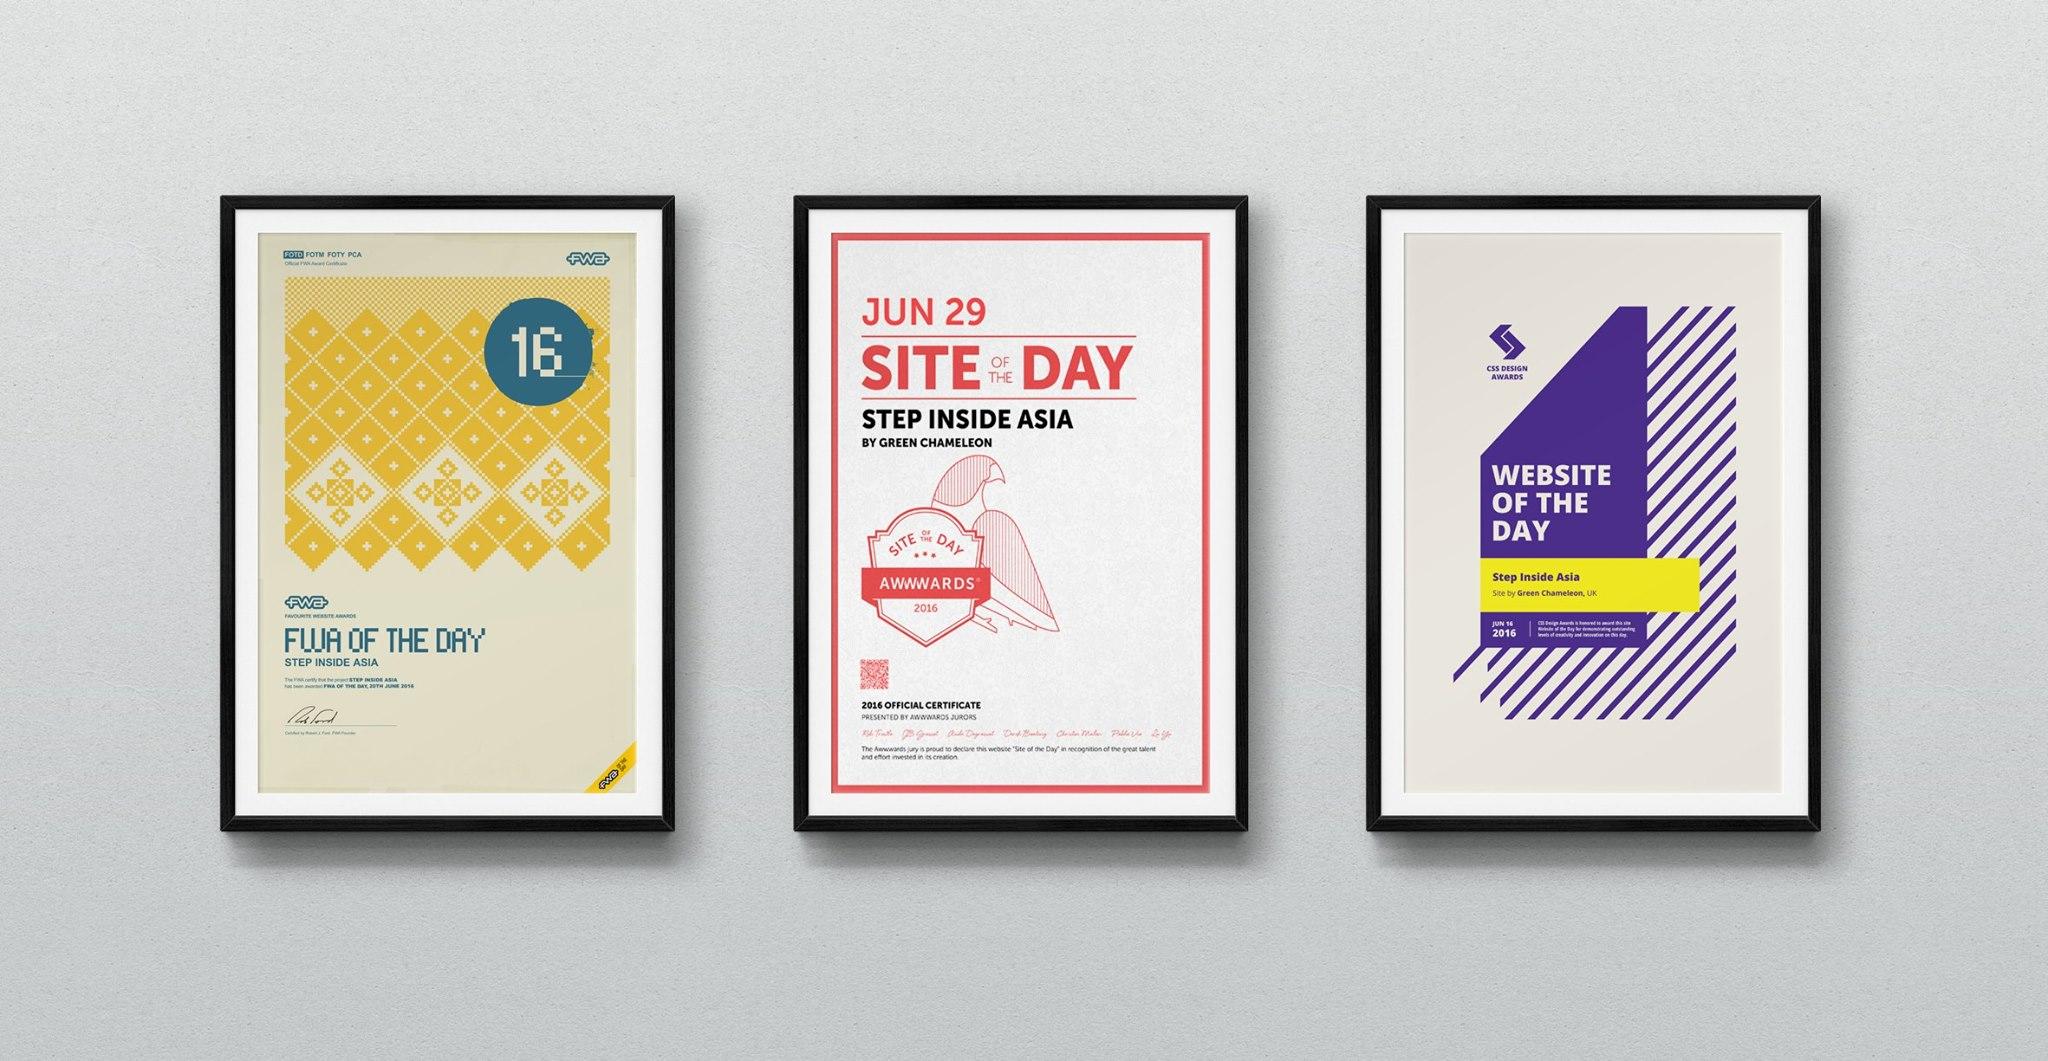 Web Design Award | Step Inside Asia Campaign Wins 3 Web Design Awards